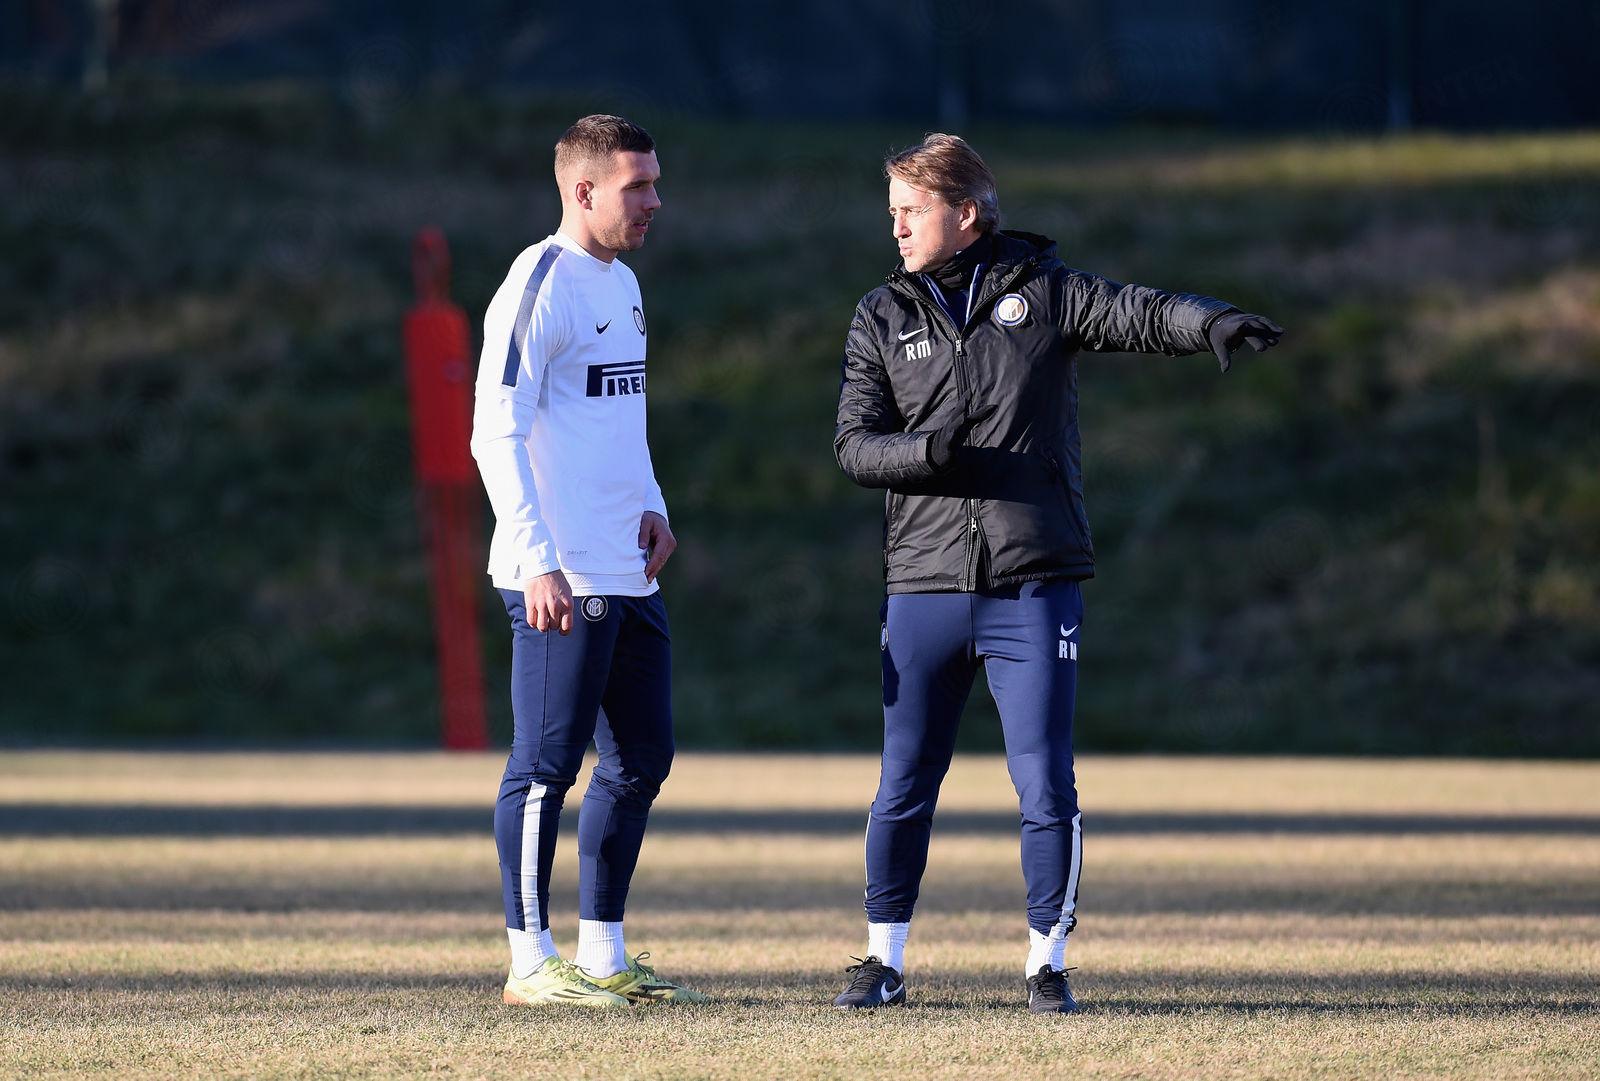 Podolski joins squad for training ahead of Juve clash